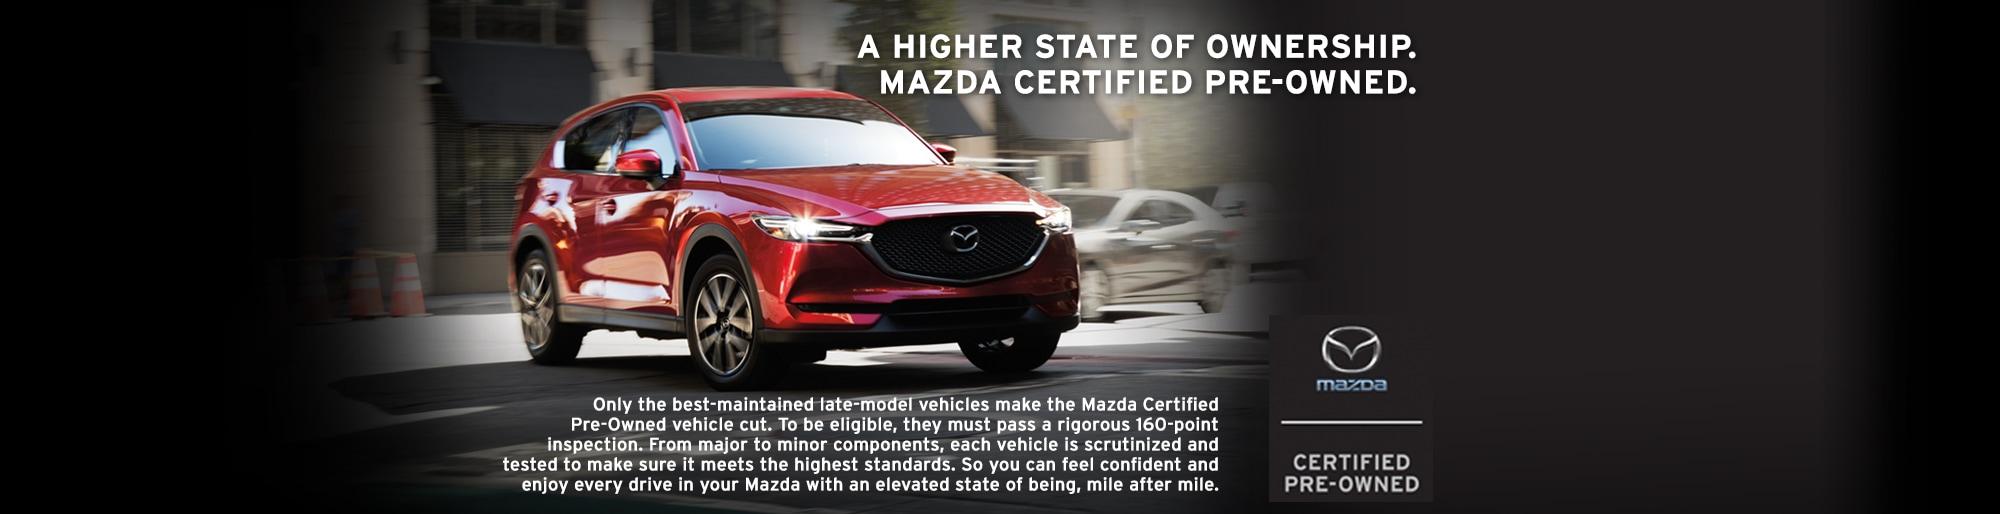 Flow Mazda Of Greensboro New Mazda Dealership In Greensboro Nc